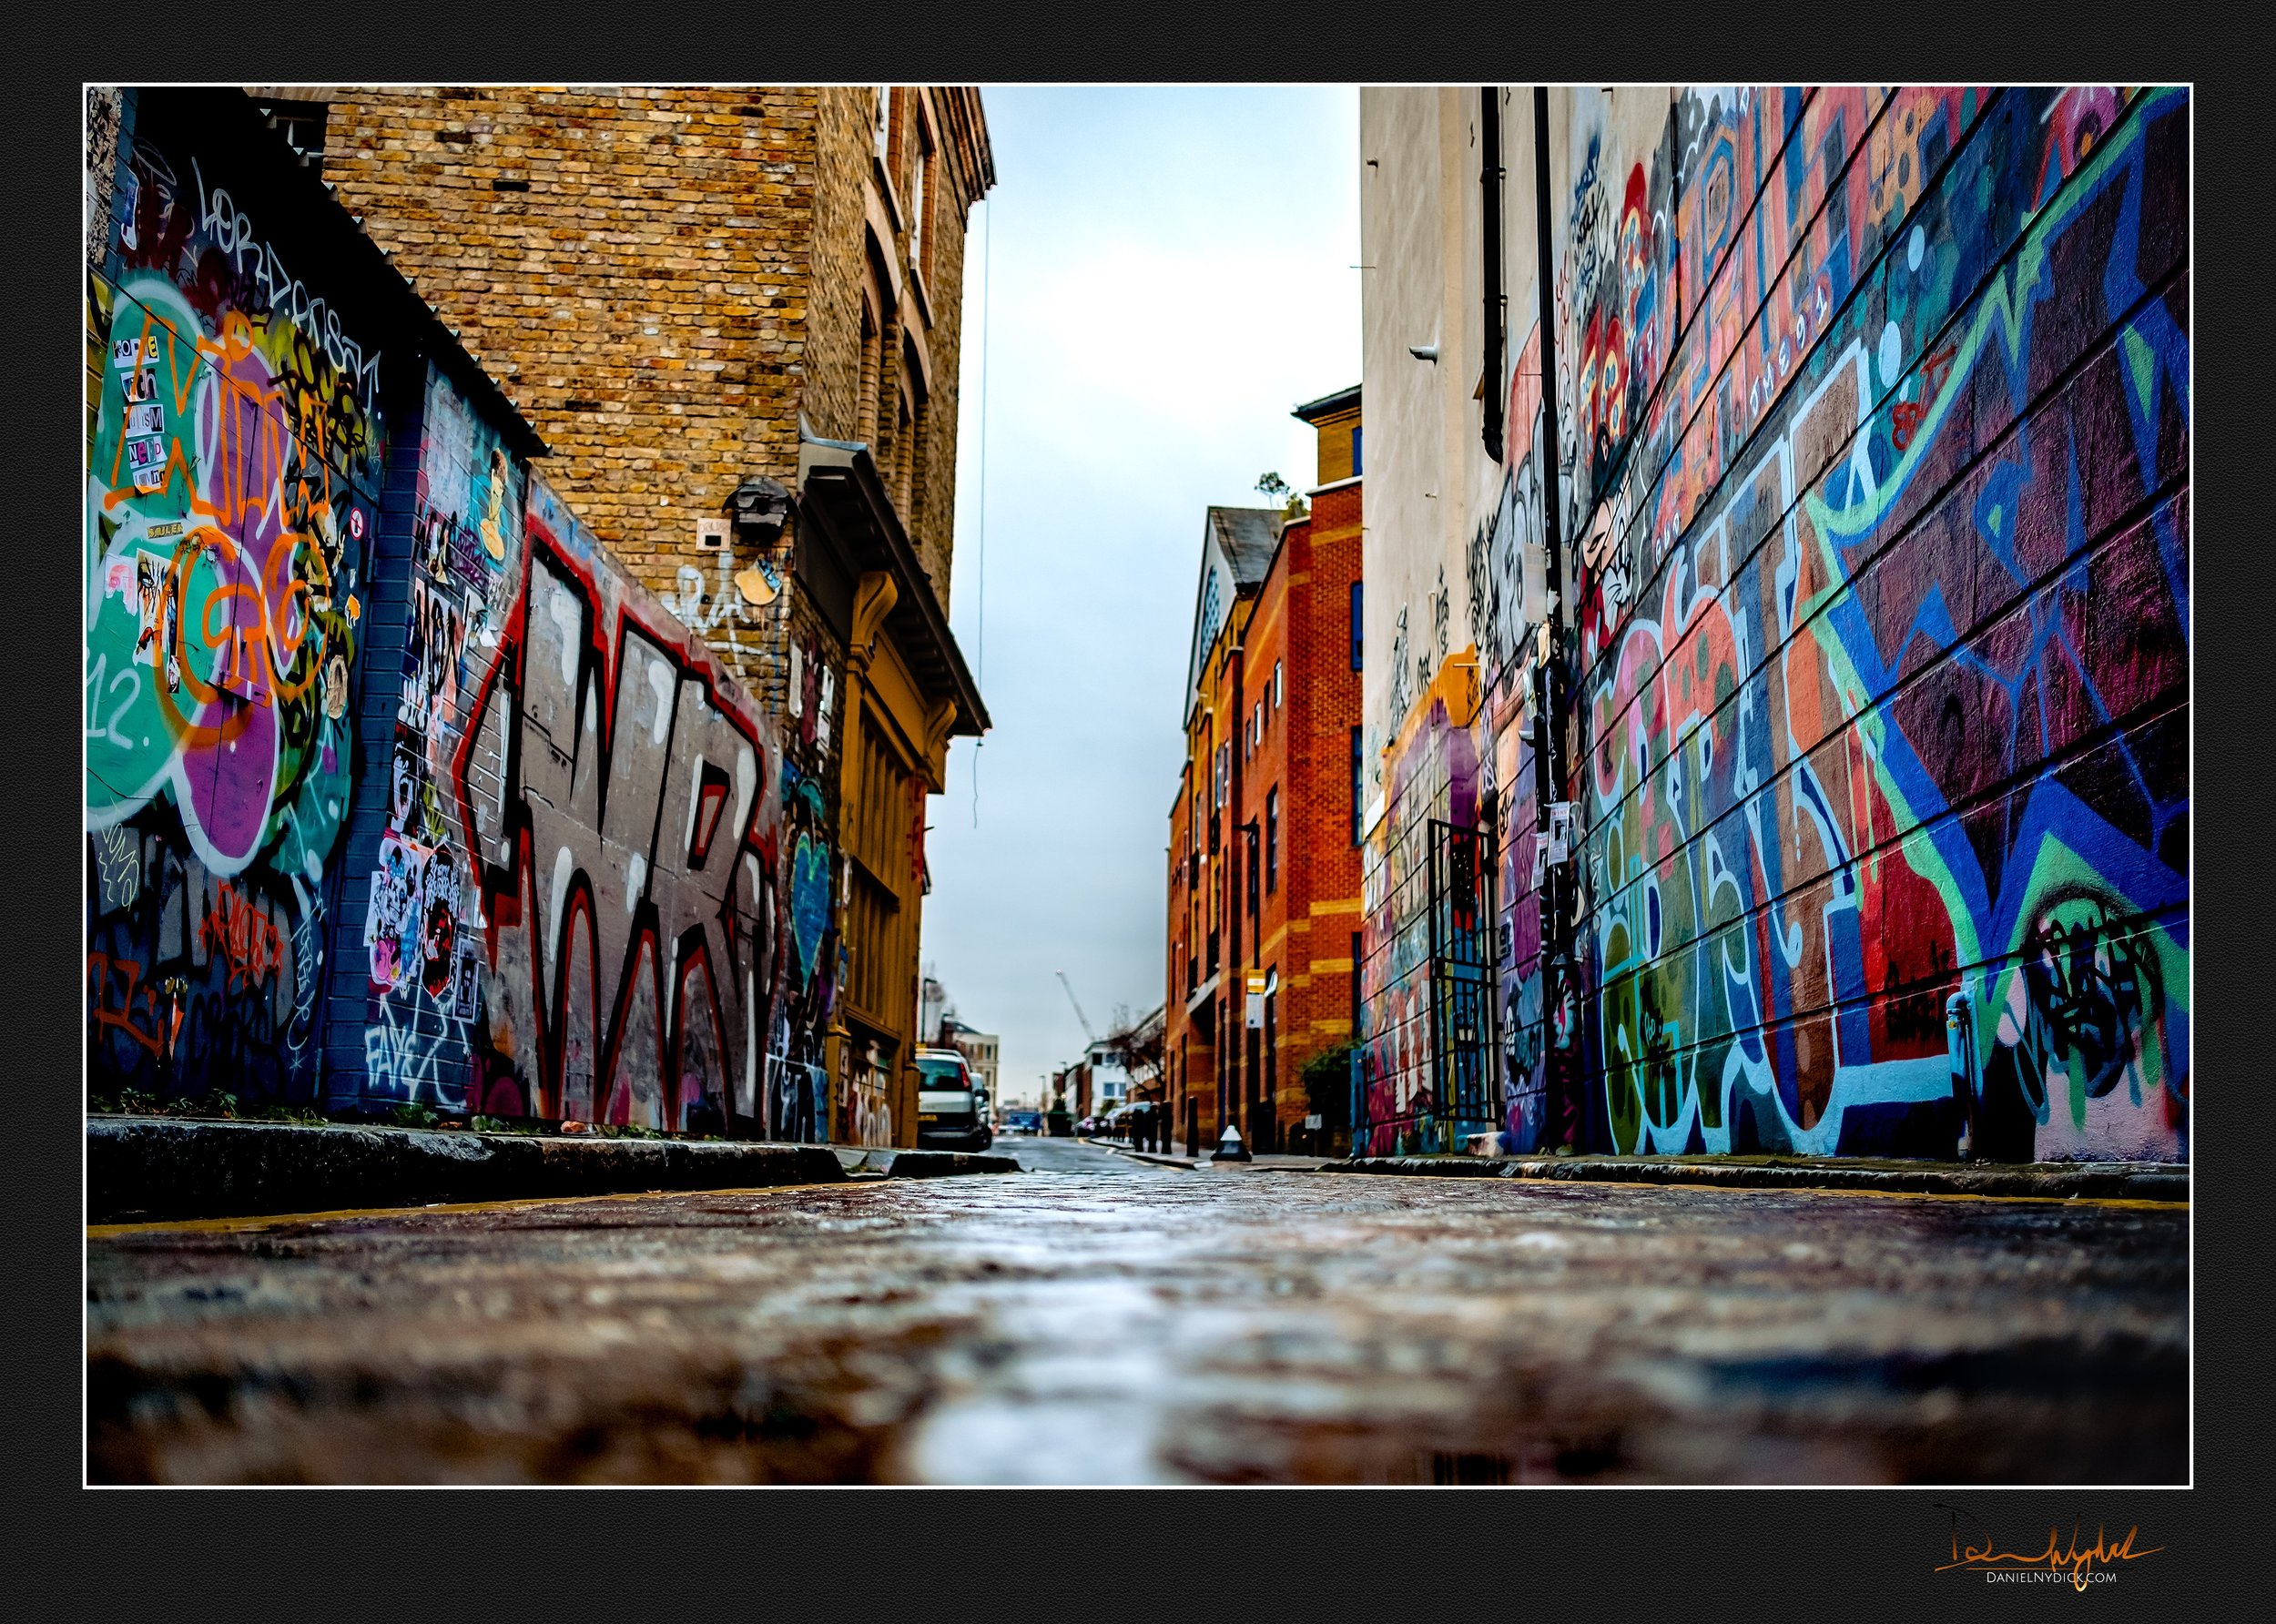 low angle, street phtography, england